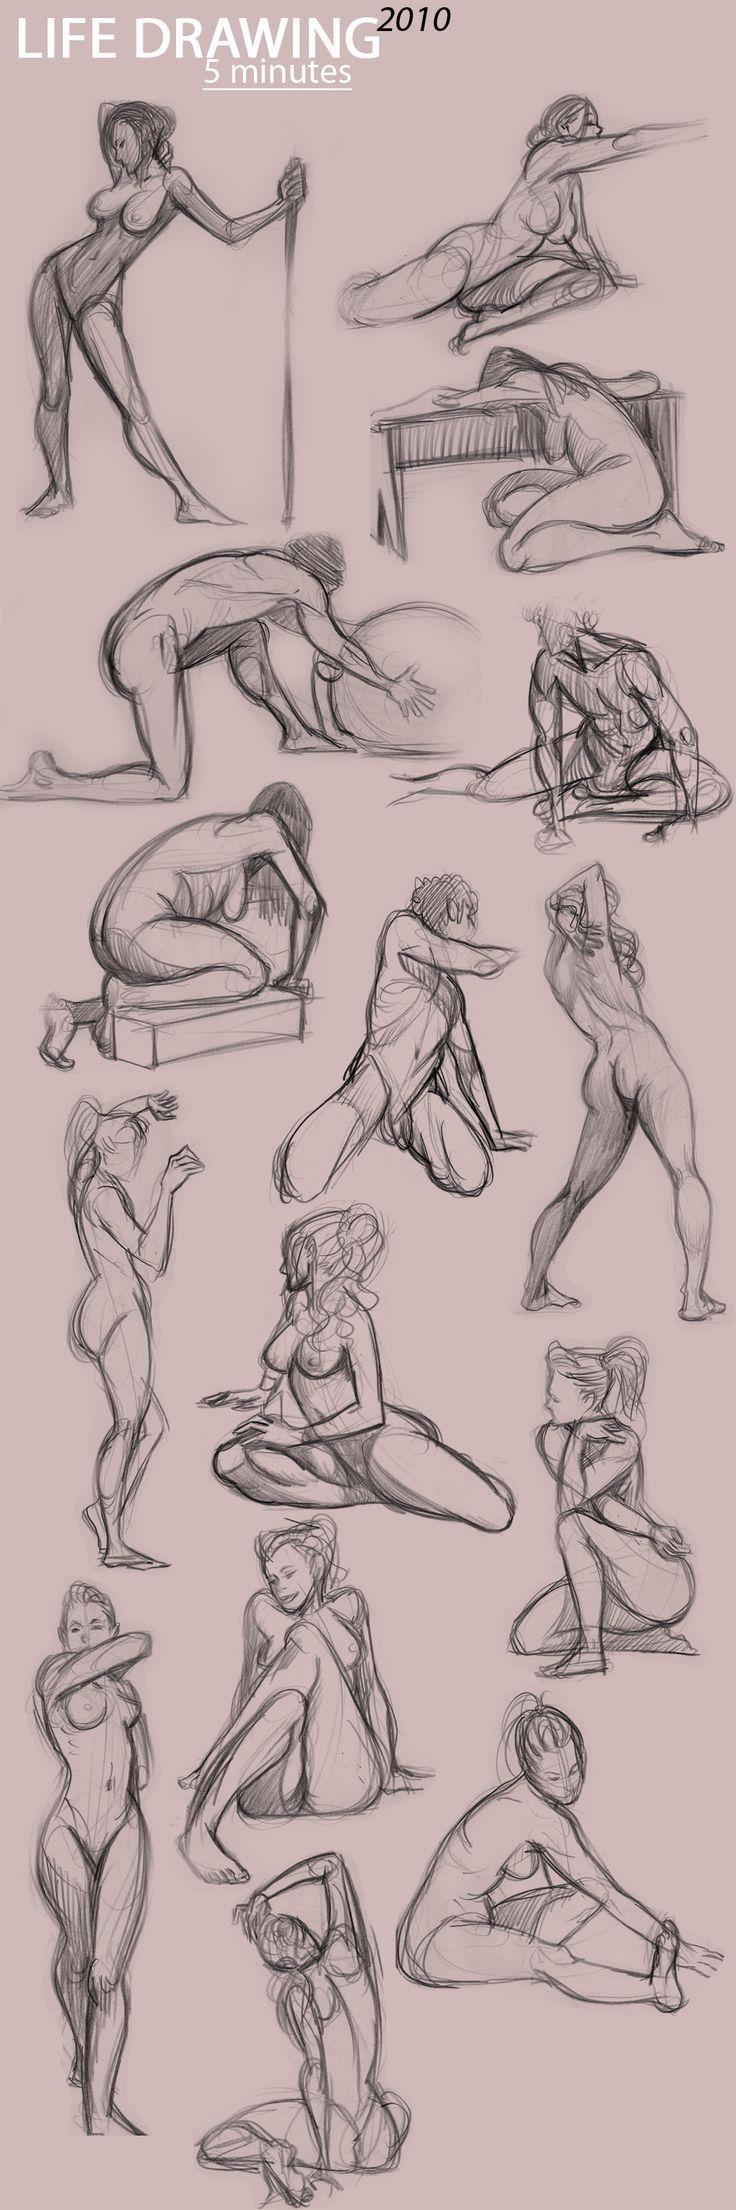 life drawing, anatomy, poses